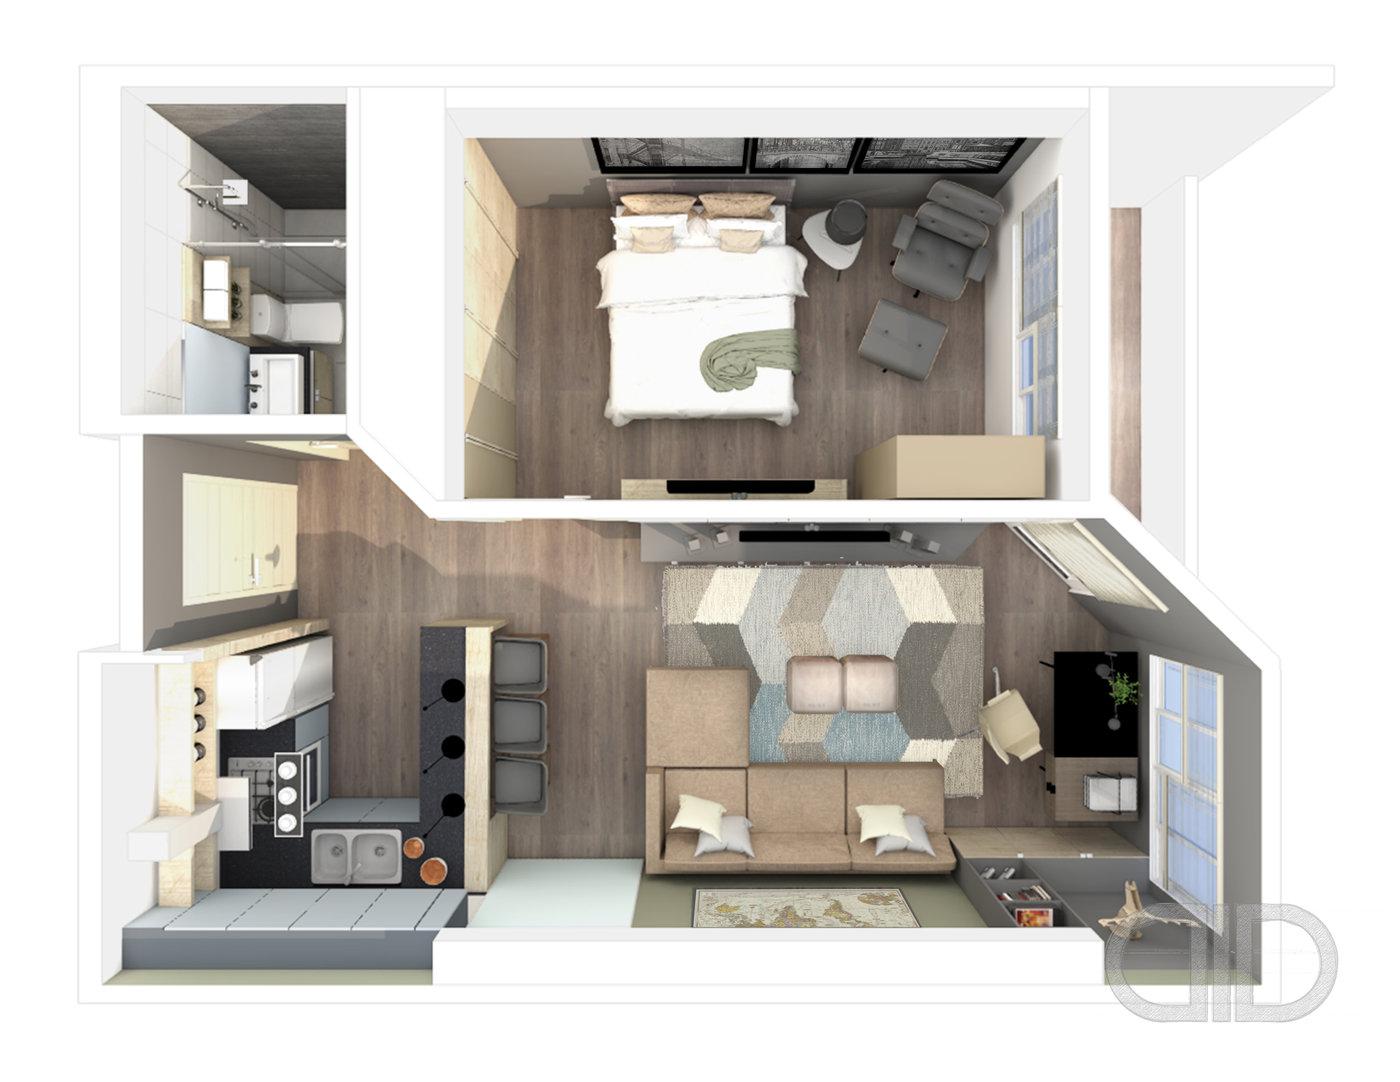 11 Bedroom Unit - Bachelor Pad by Erica Regina Ang at Coroflot.com